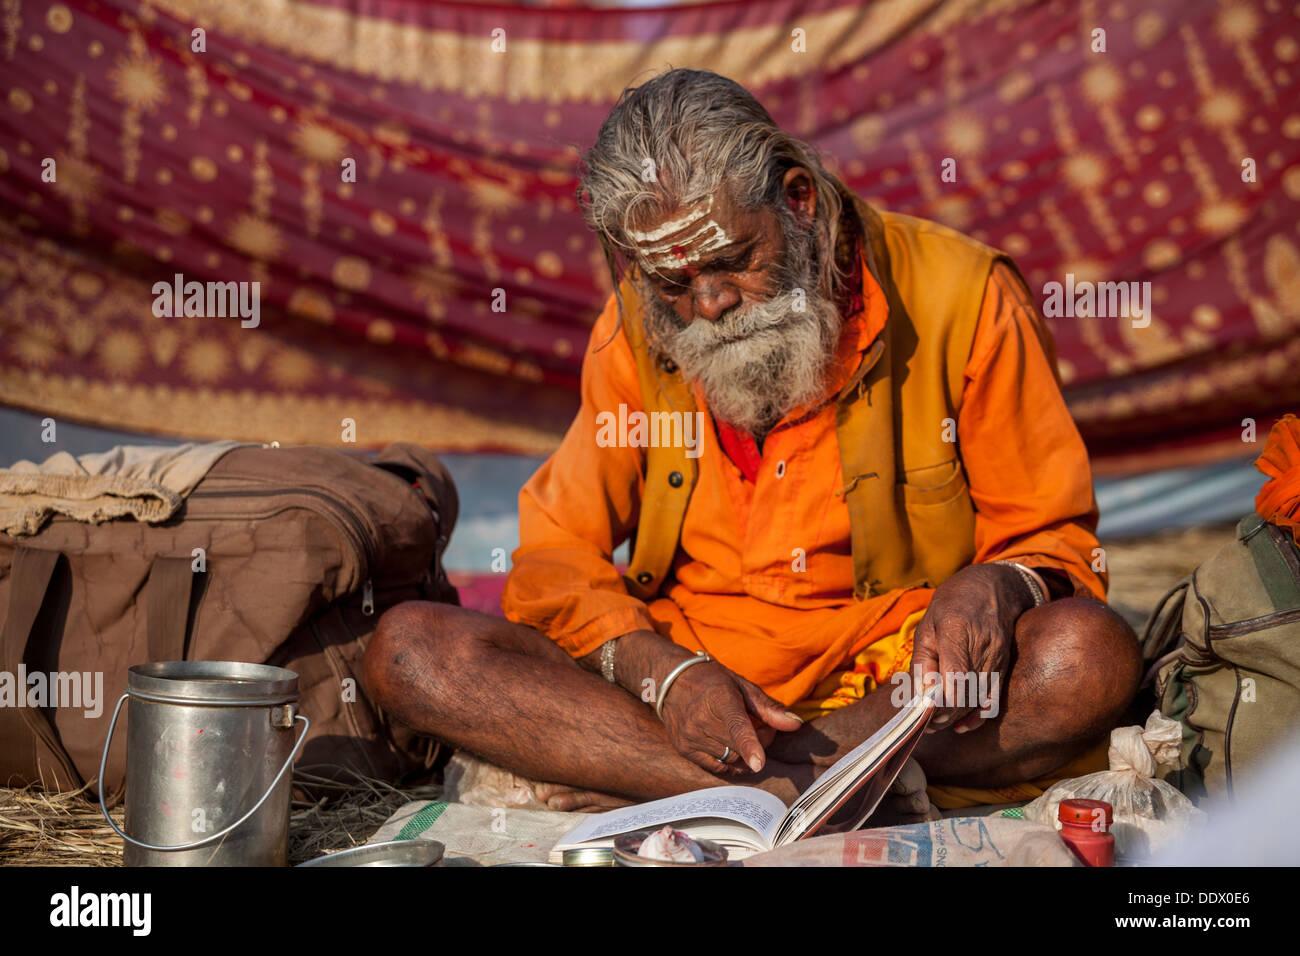 Naga Sadhu Portrait - The Great Renounce , reading a manuscript with mantras at the Kumbh Mella 2013 in Allahabad, India - Stock Image